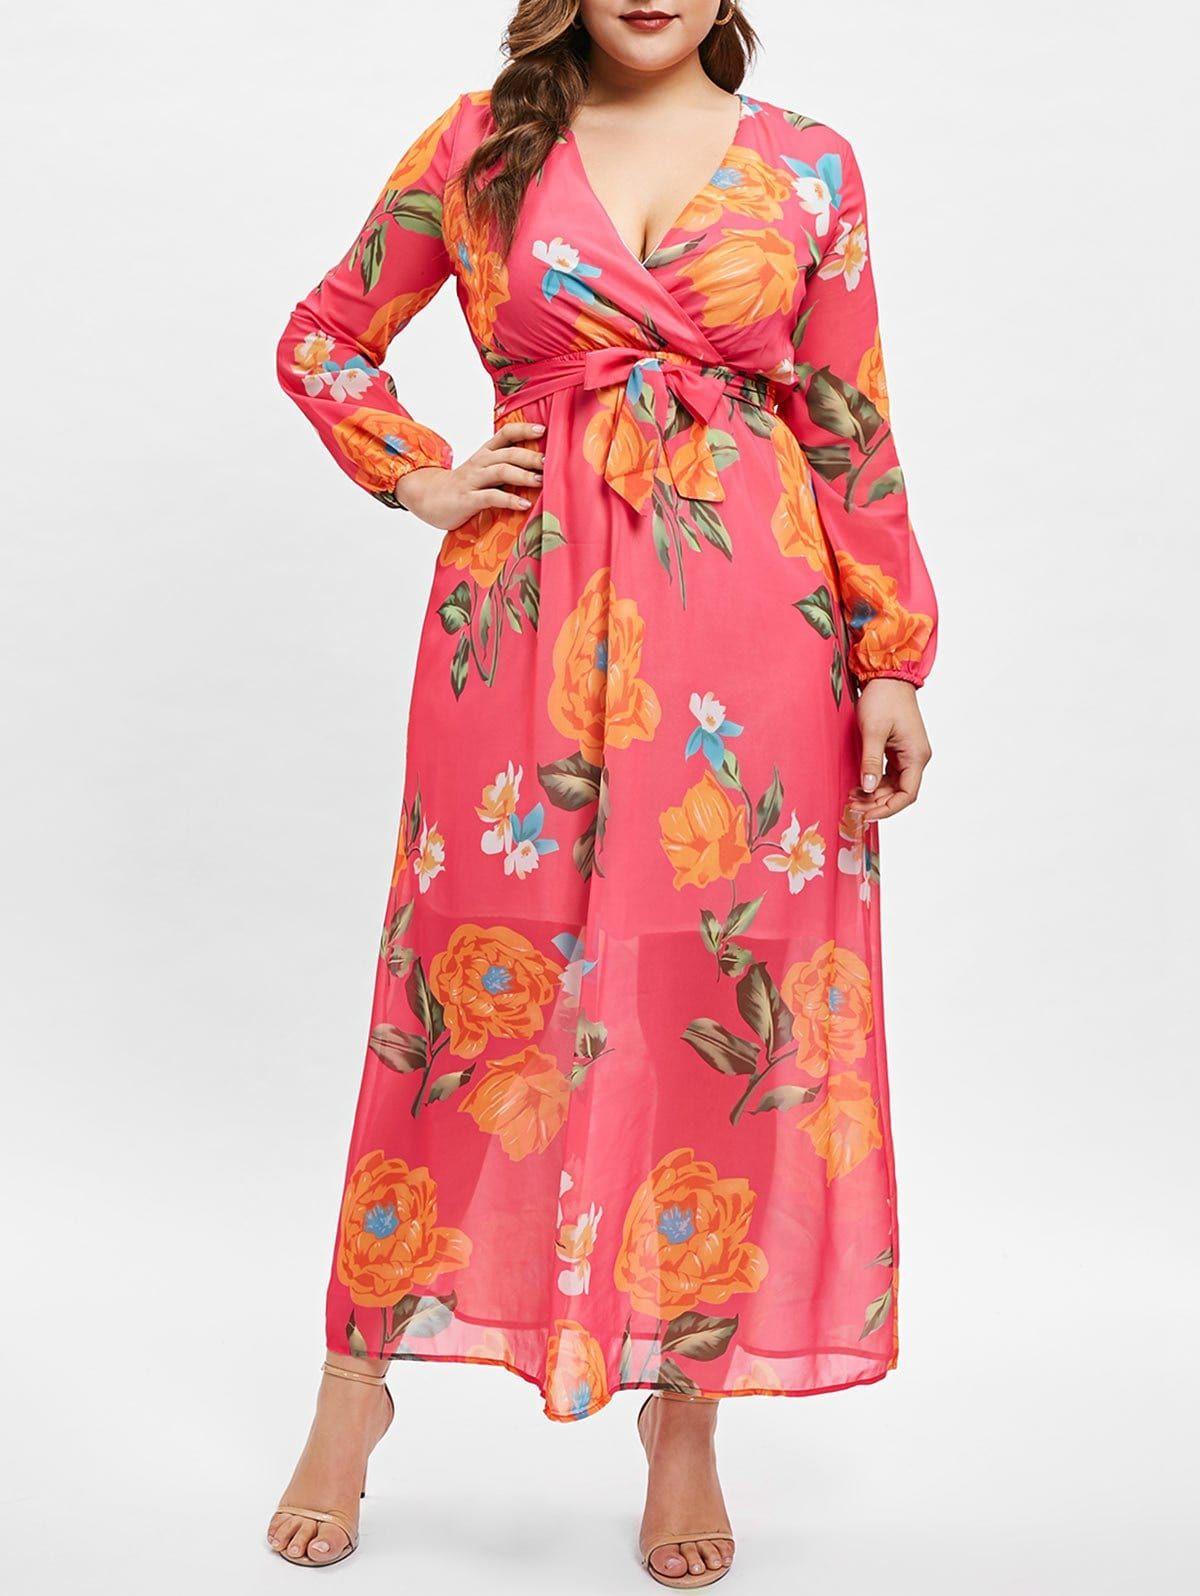 56e76e44a67ea Wrap Floral Print Long Sleeve Plus Size Dress Rosegal Christmas Special  Sale Use Code:RGBF1